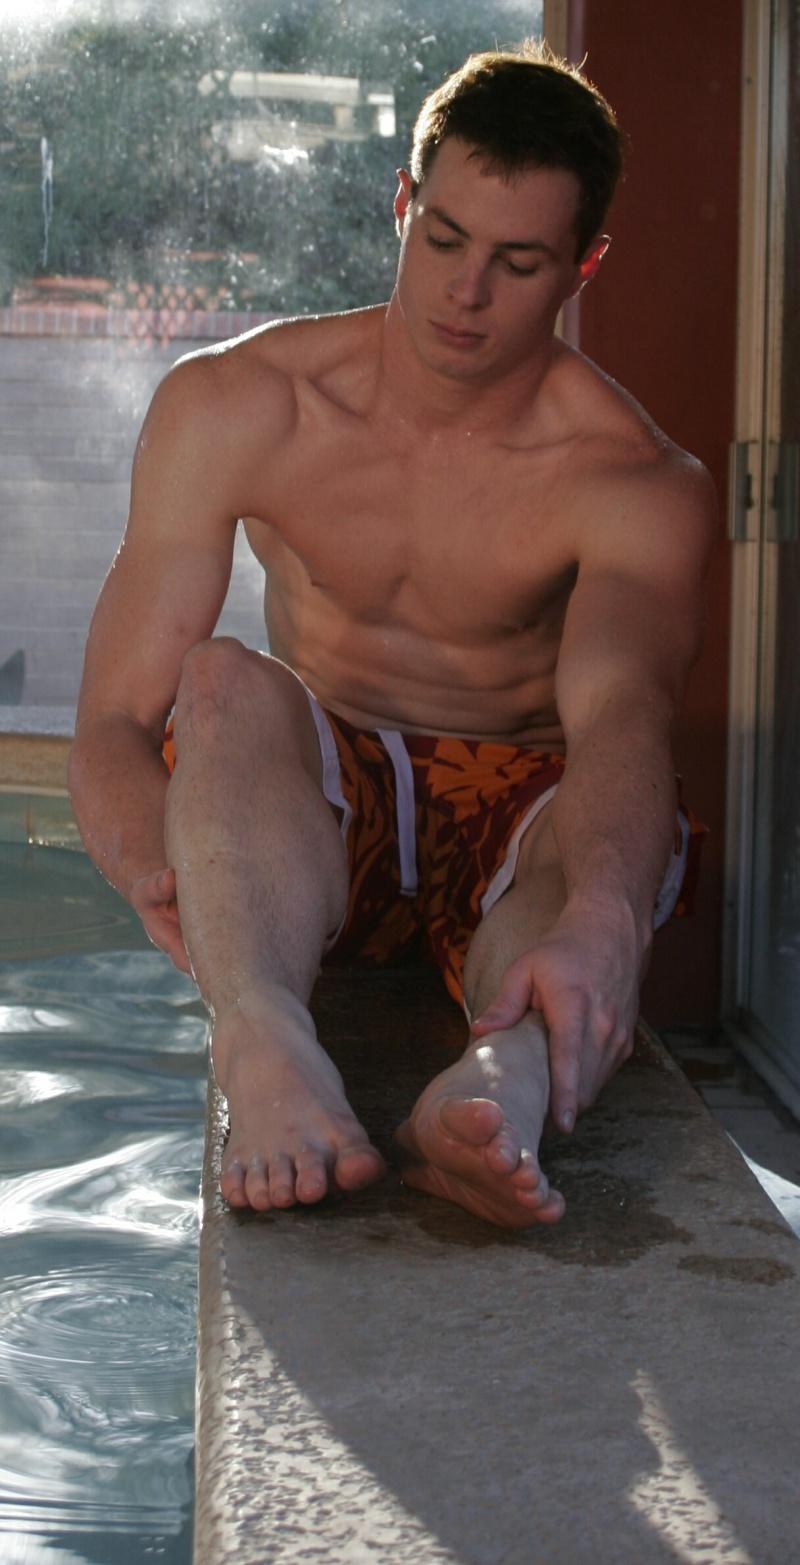 Sep 24, 2007 Tim A Janes